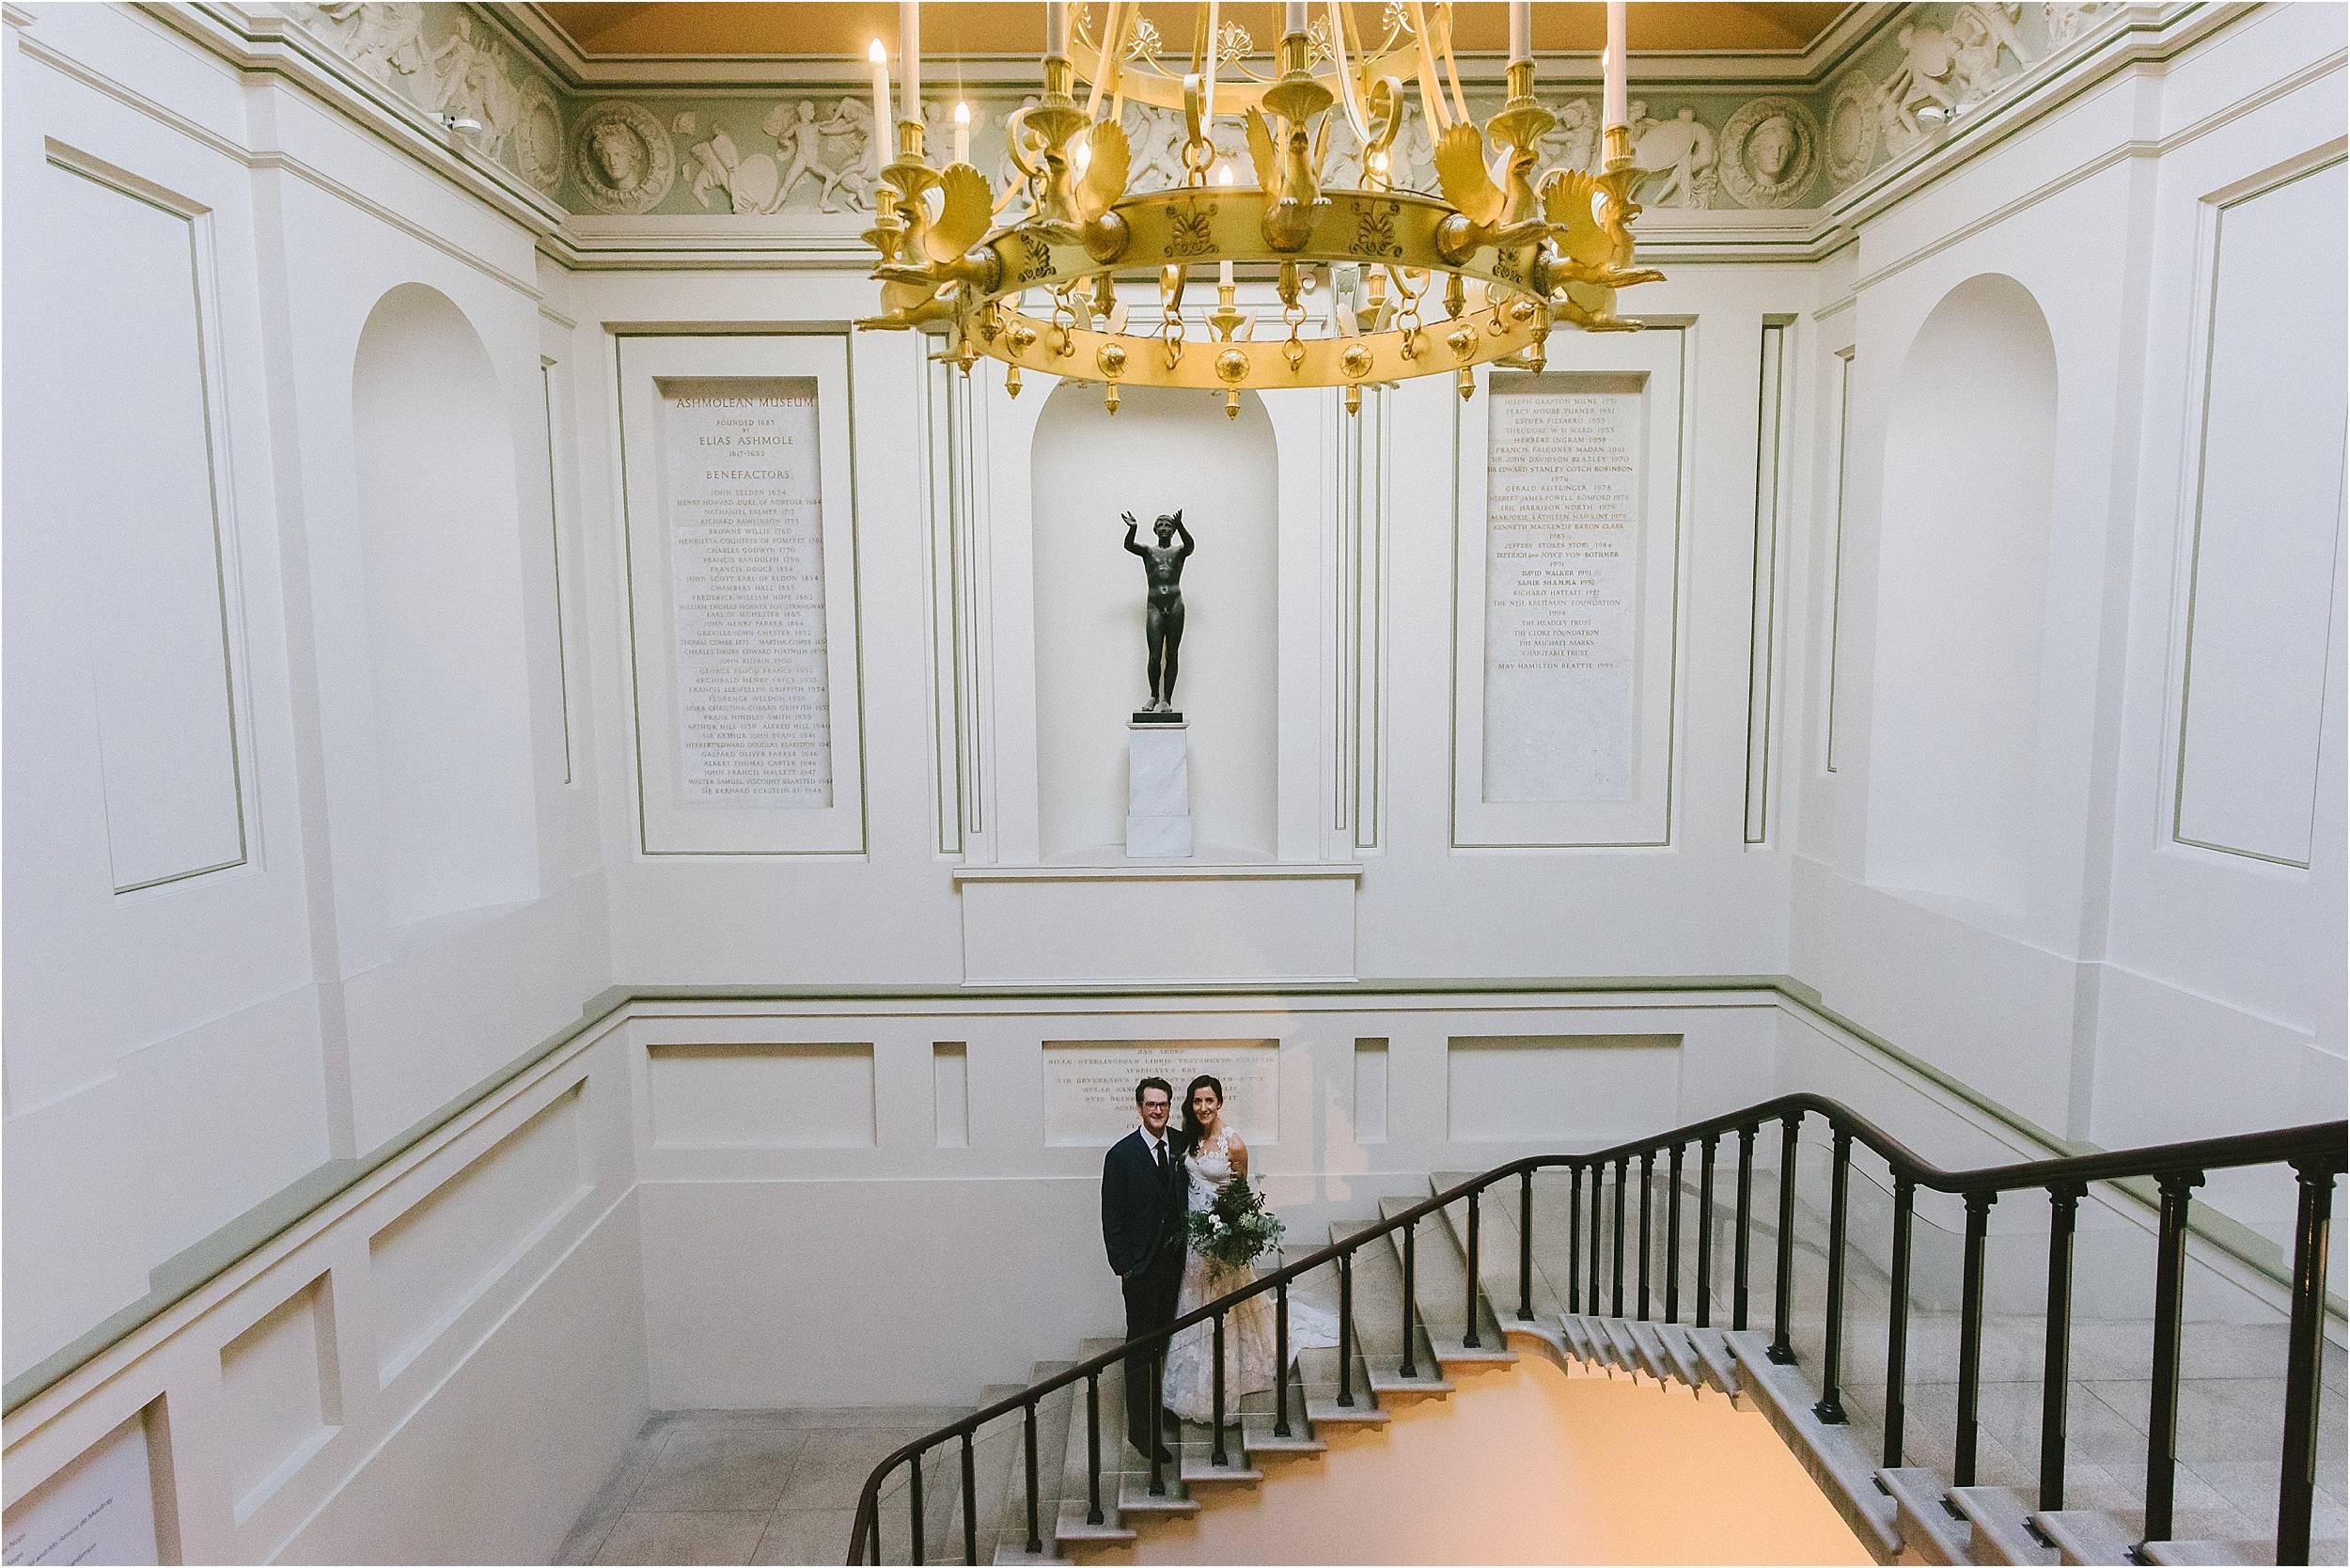 Oxford Ashmolean Museum Wedding Photography_0096.jpg